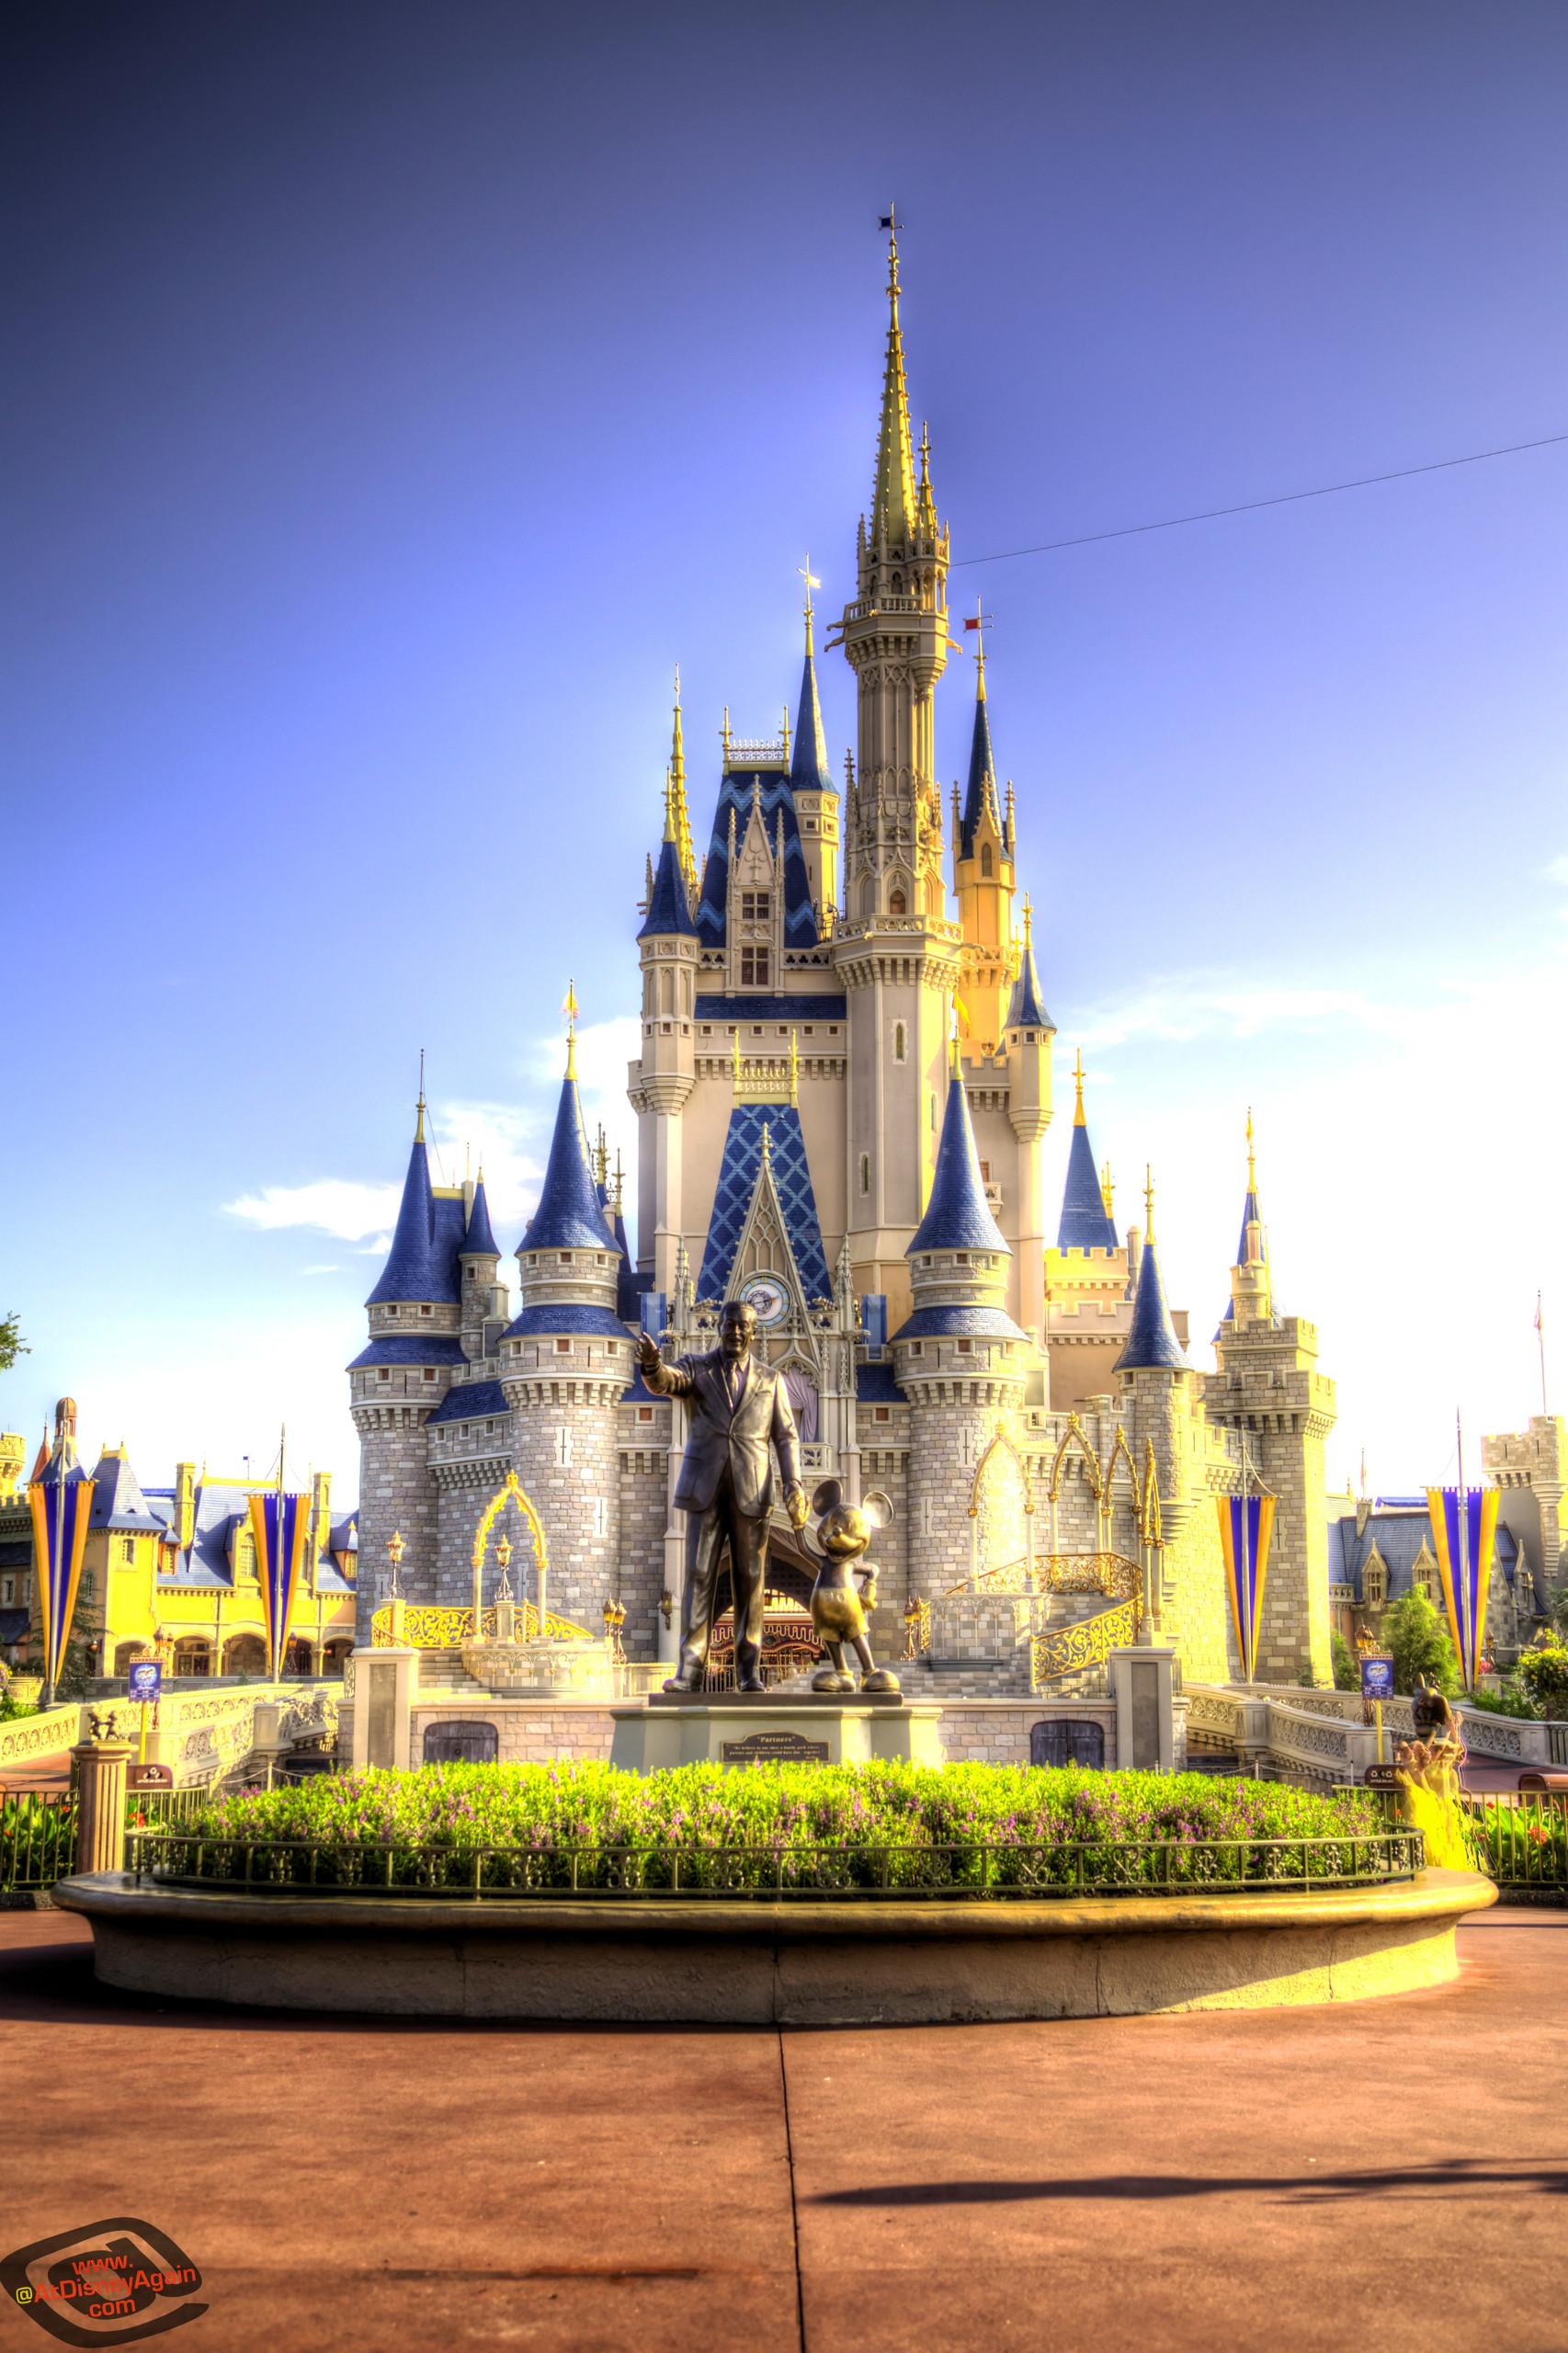 Daytime Cinderella Castle Wallpaper 027